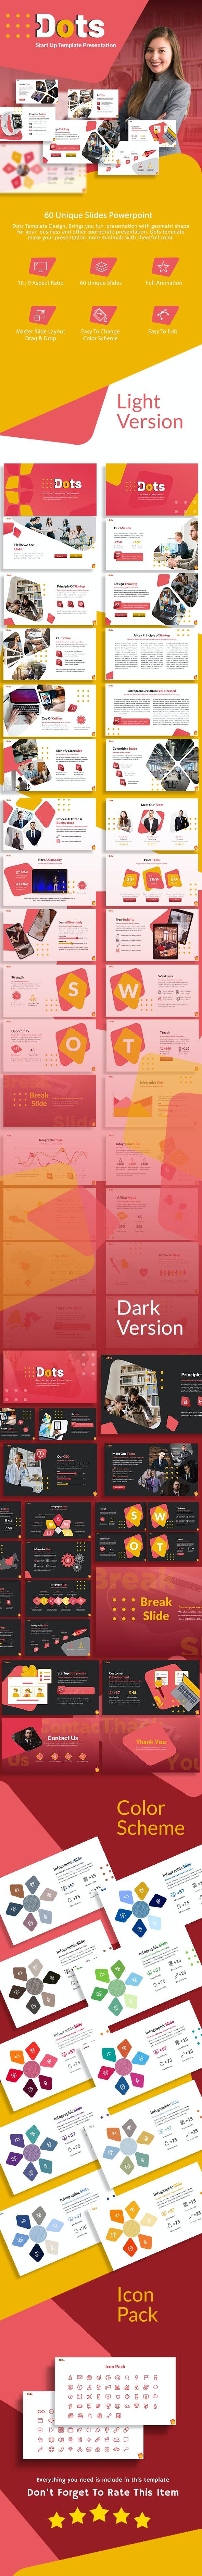 Dots Startup Presentation Template - Creative PowerPoint Templates